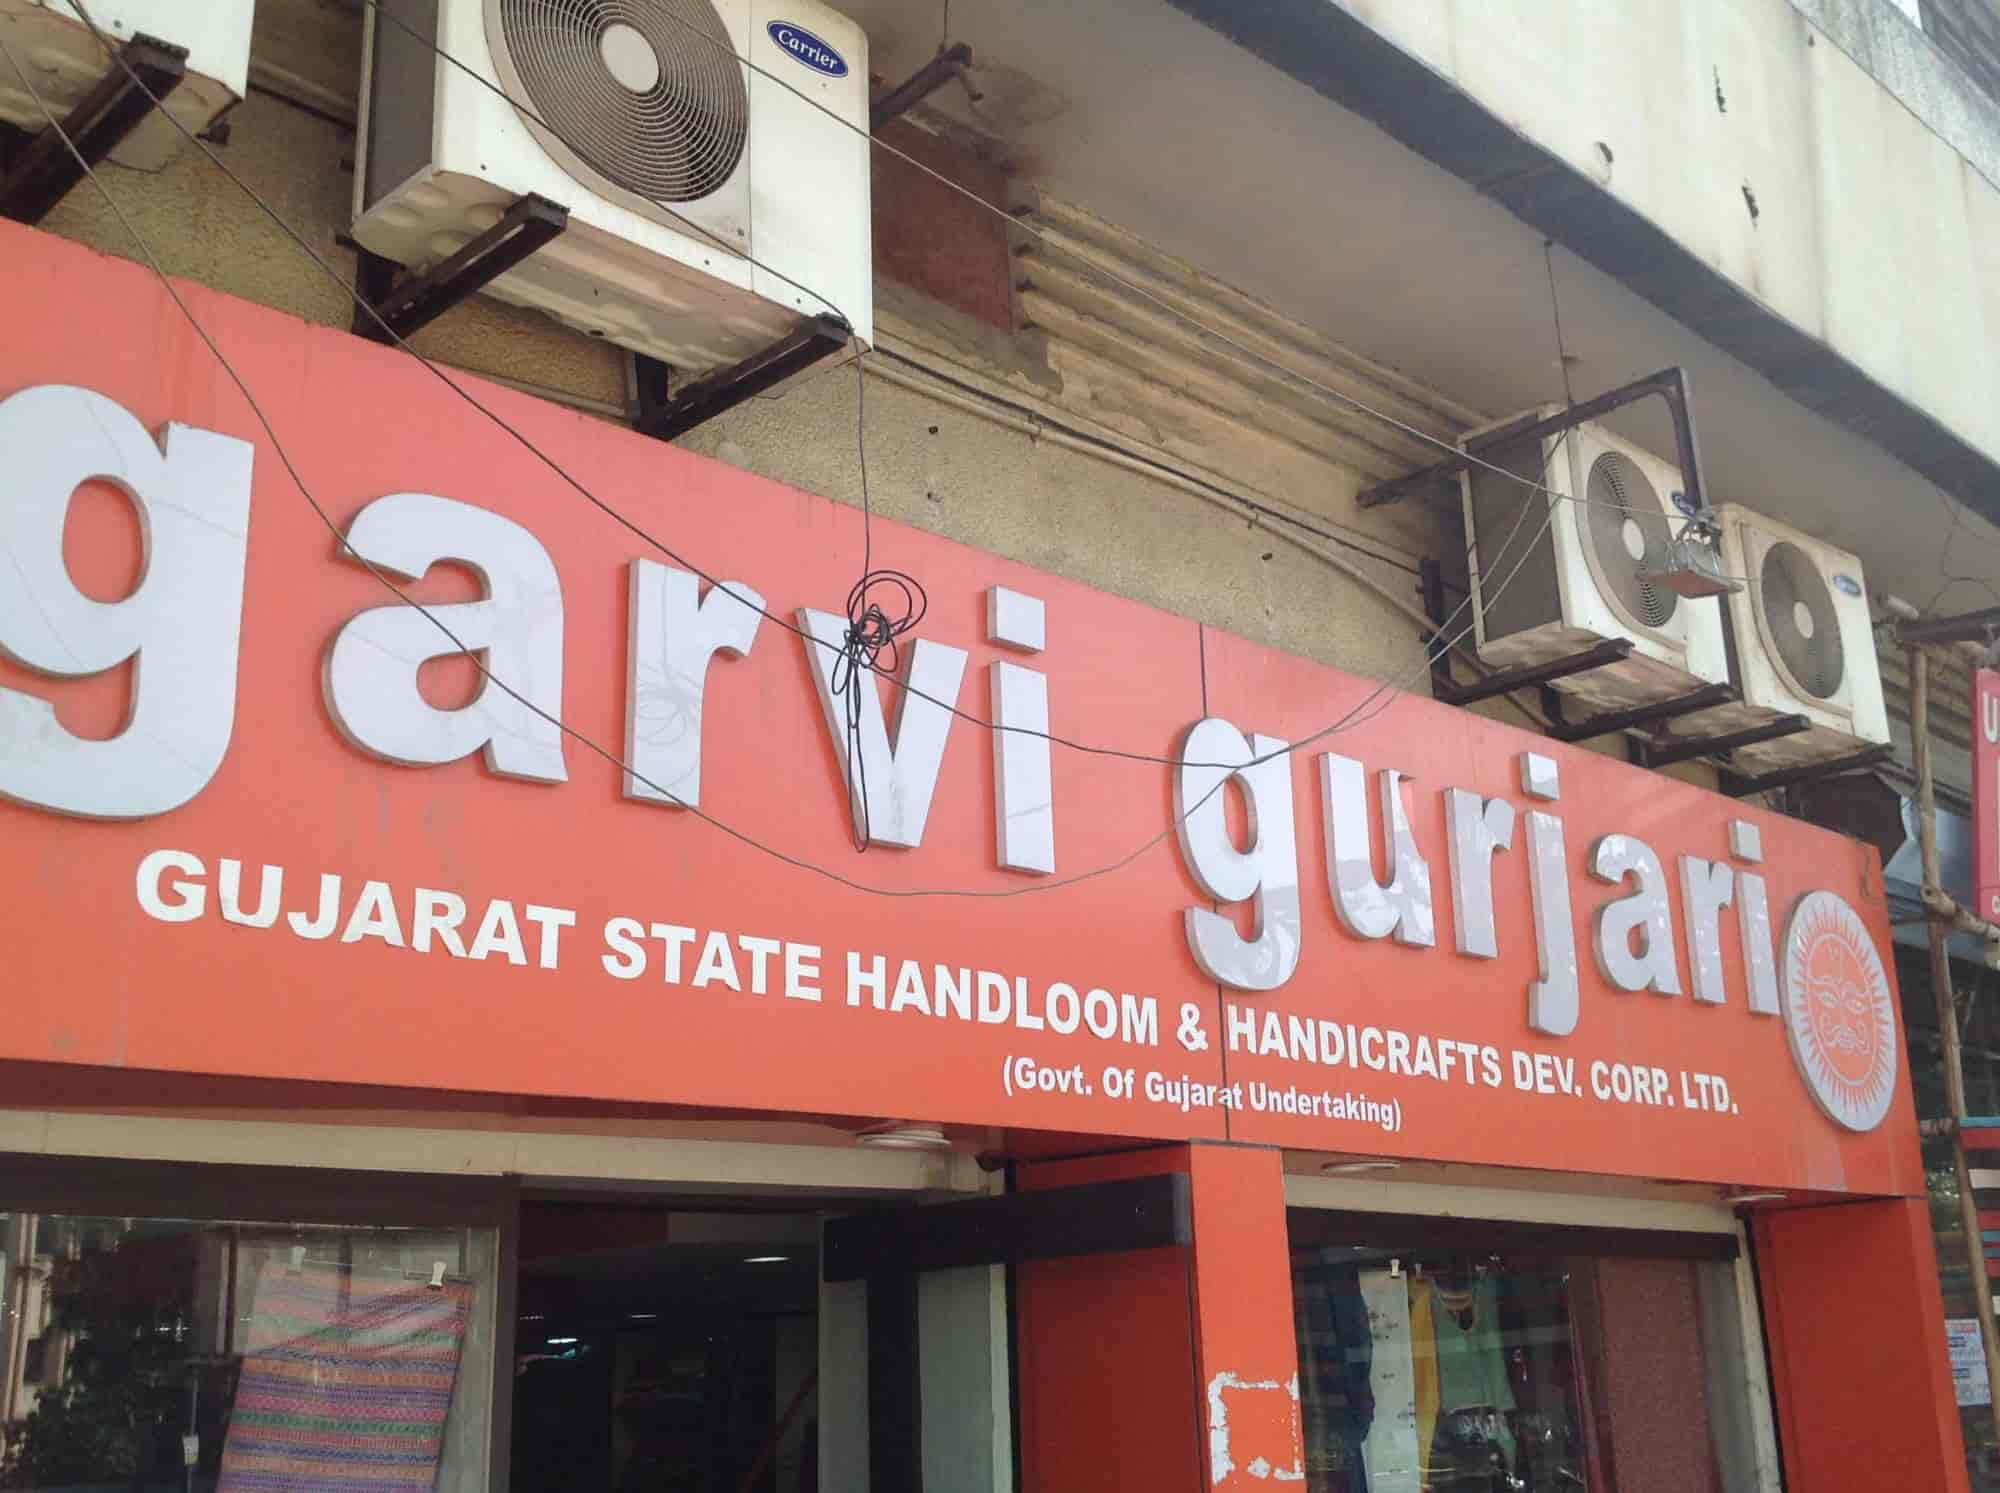 Gujarat State Handloom Handicraft Development Corporation Limited